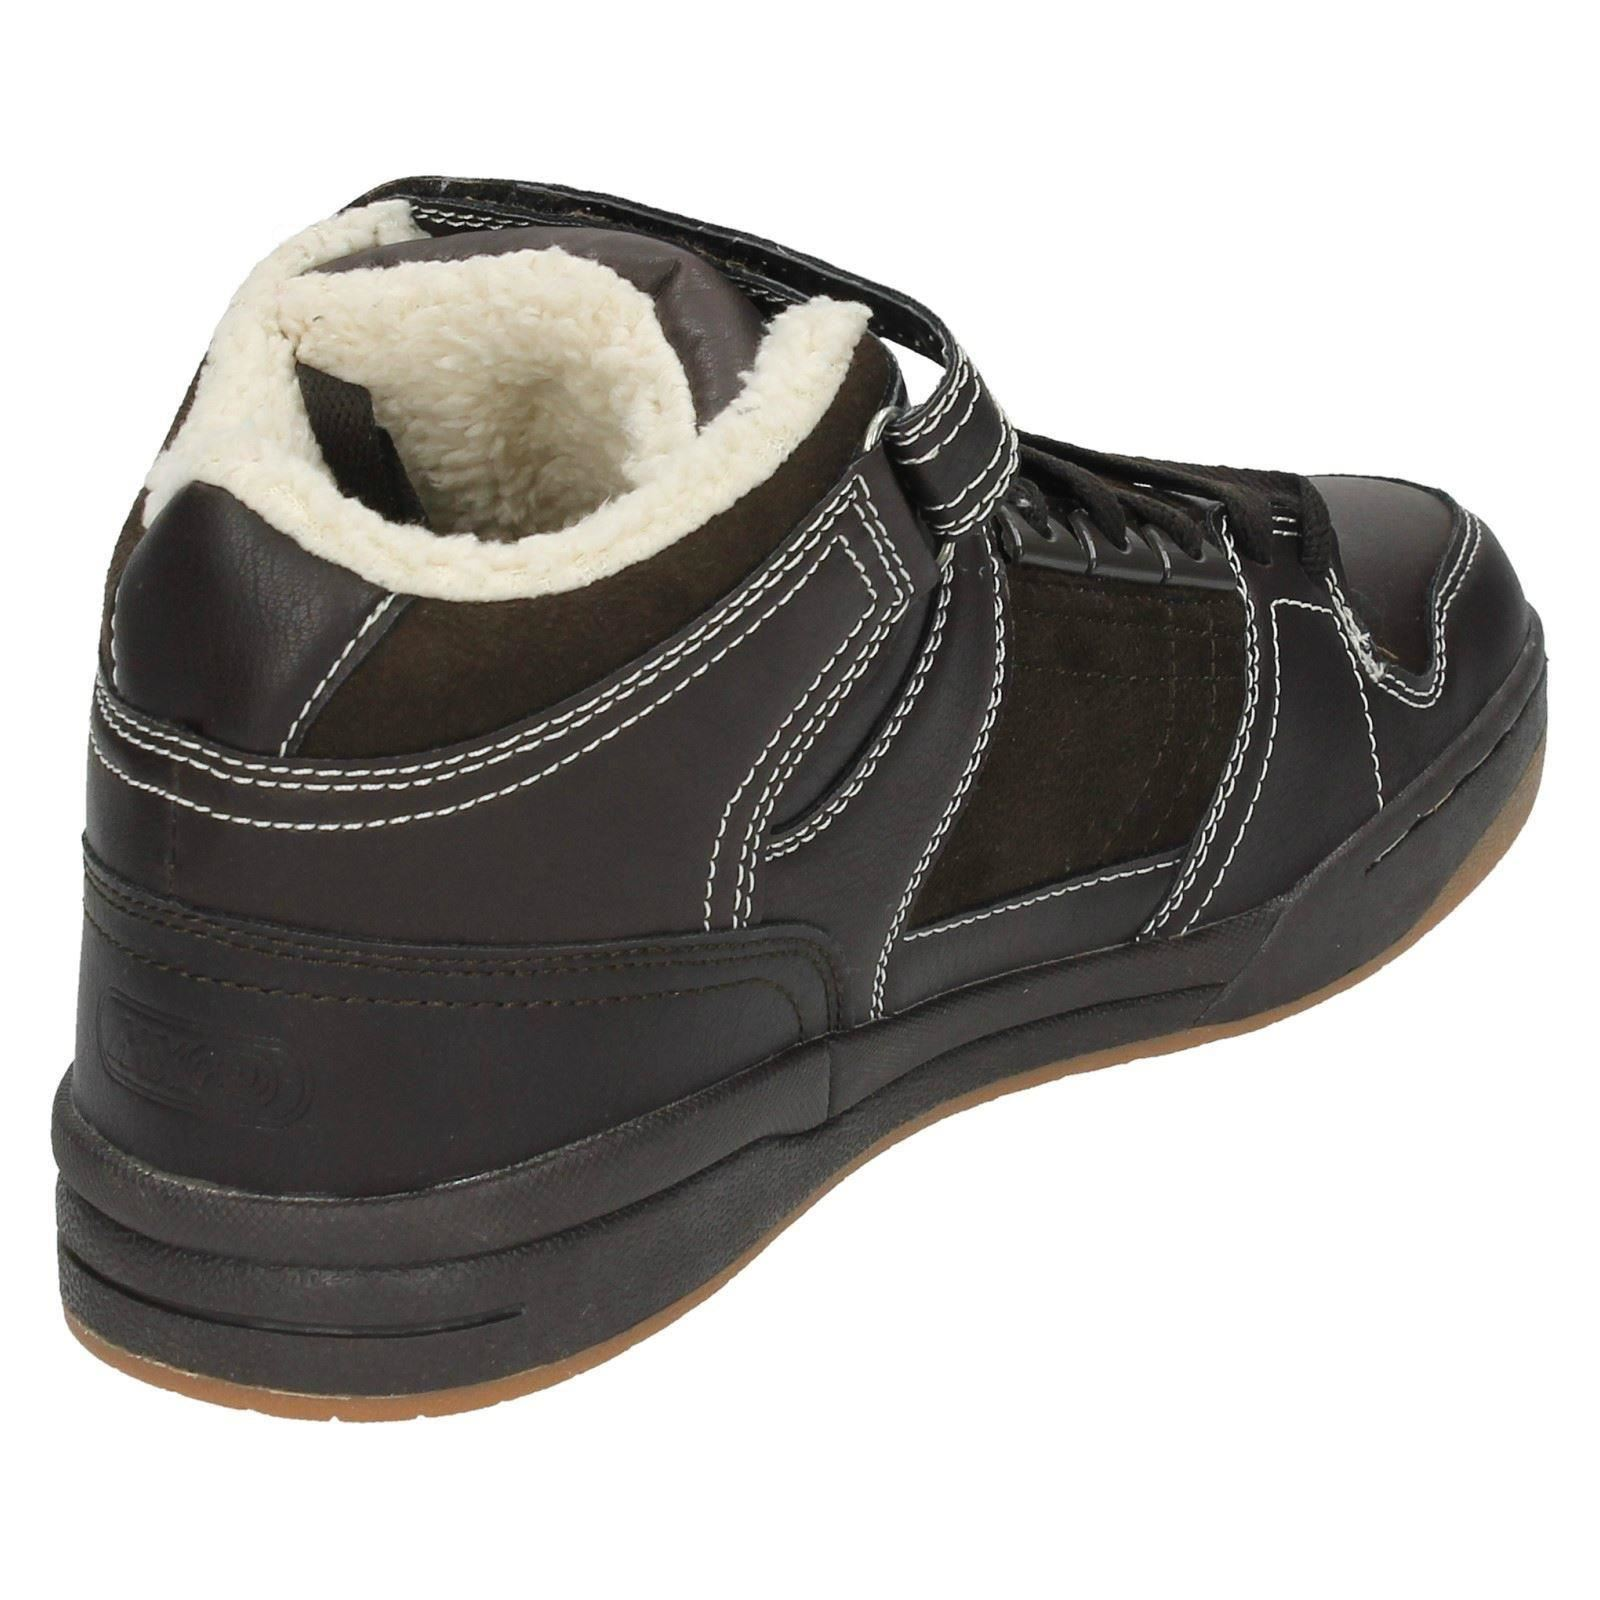 mens mx2 fur lined high top boots ebay